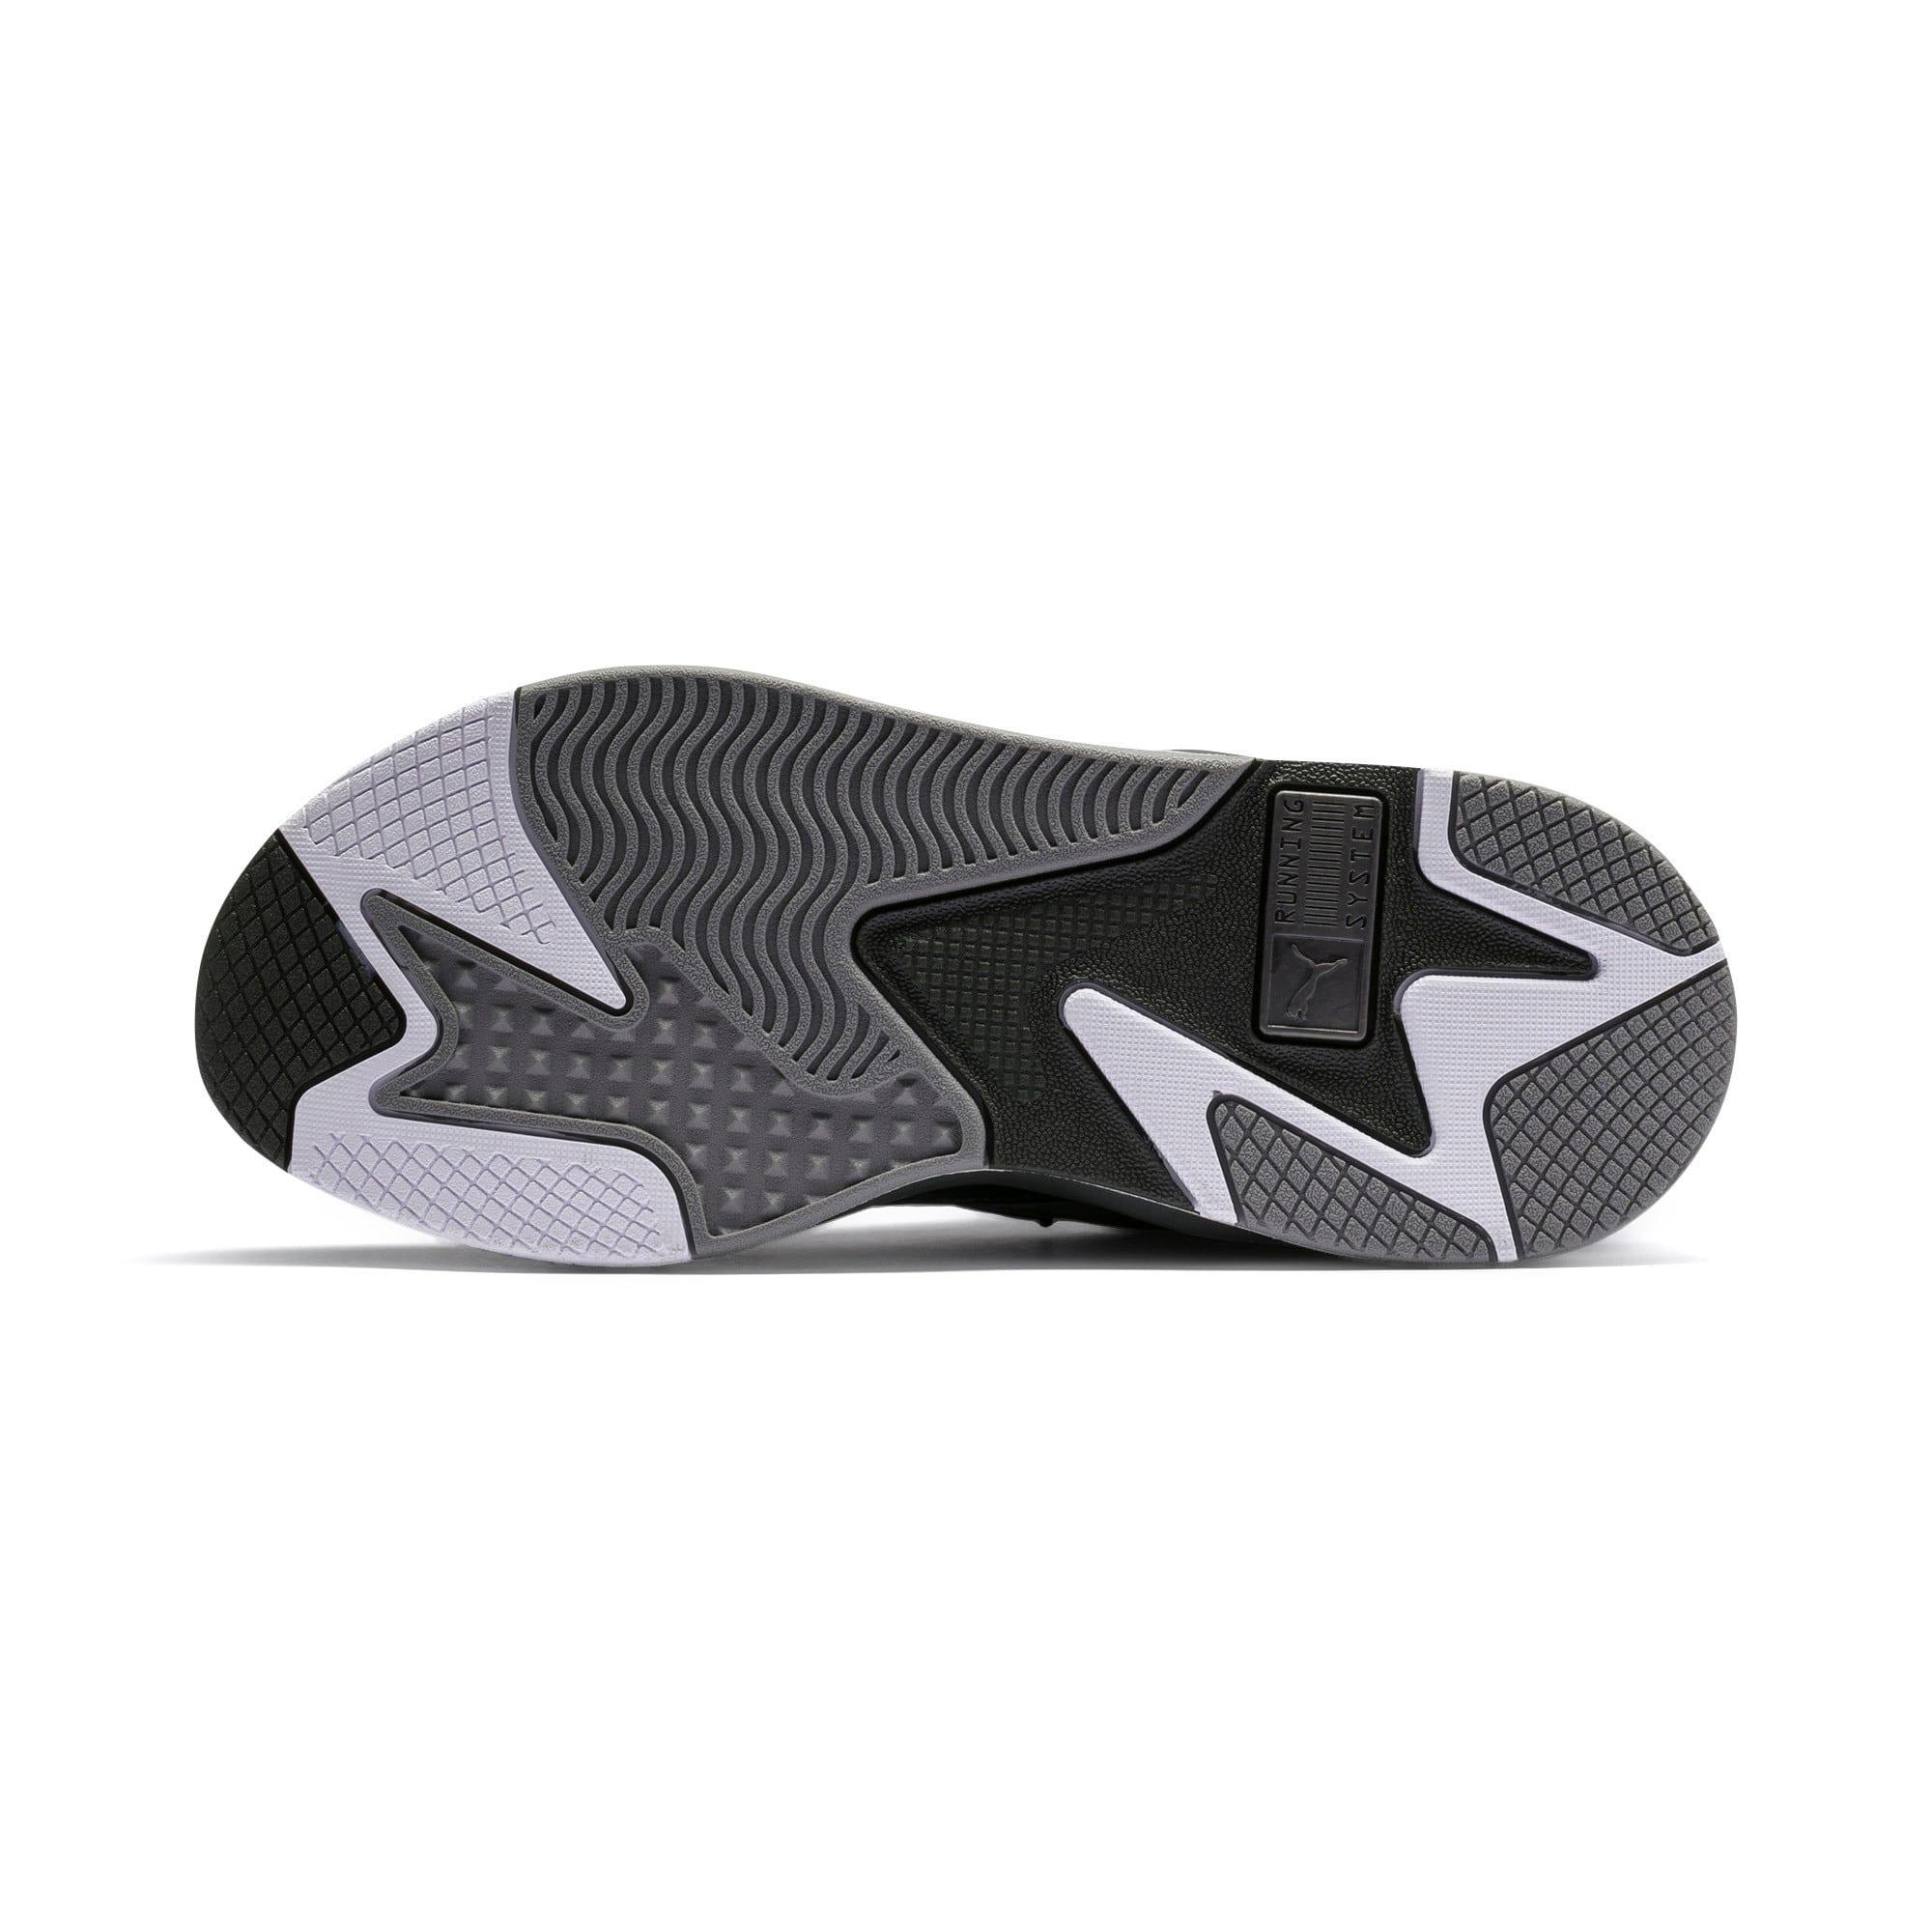 Thumbnail 5 of Basket RS-X TROPHY, Steel Gray-Dark Shadow, medium